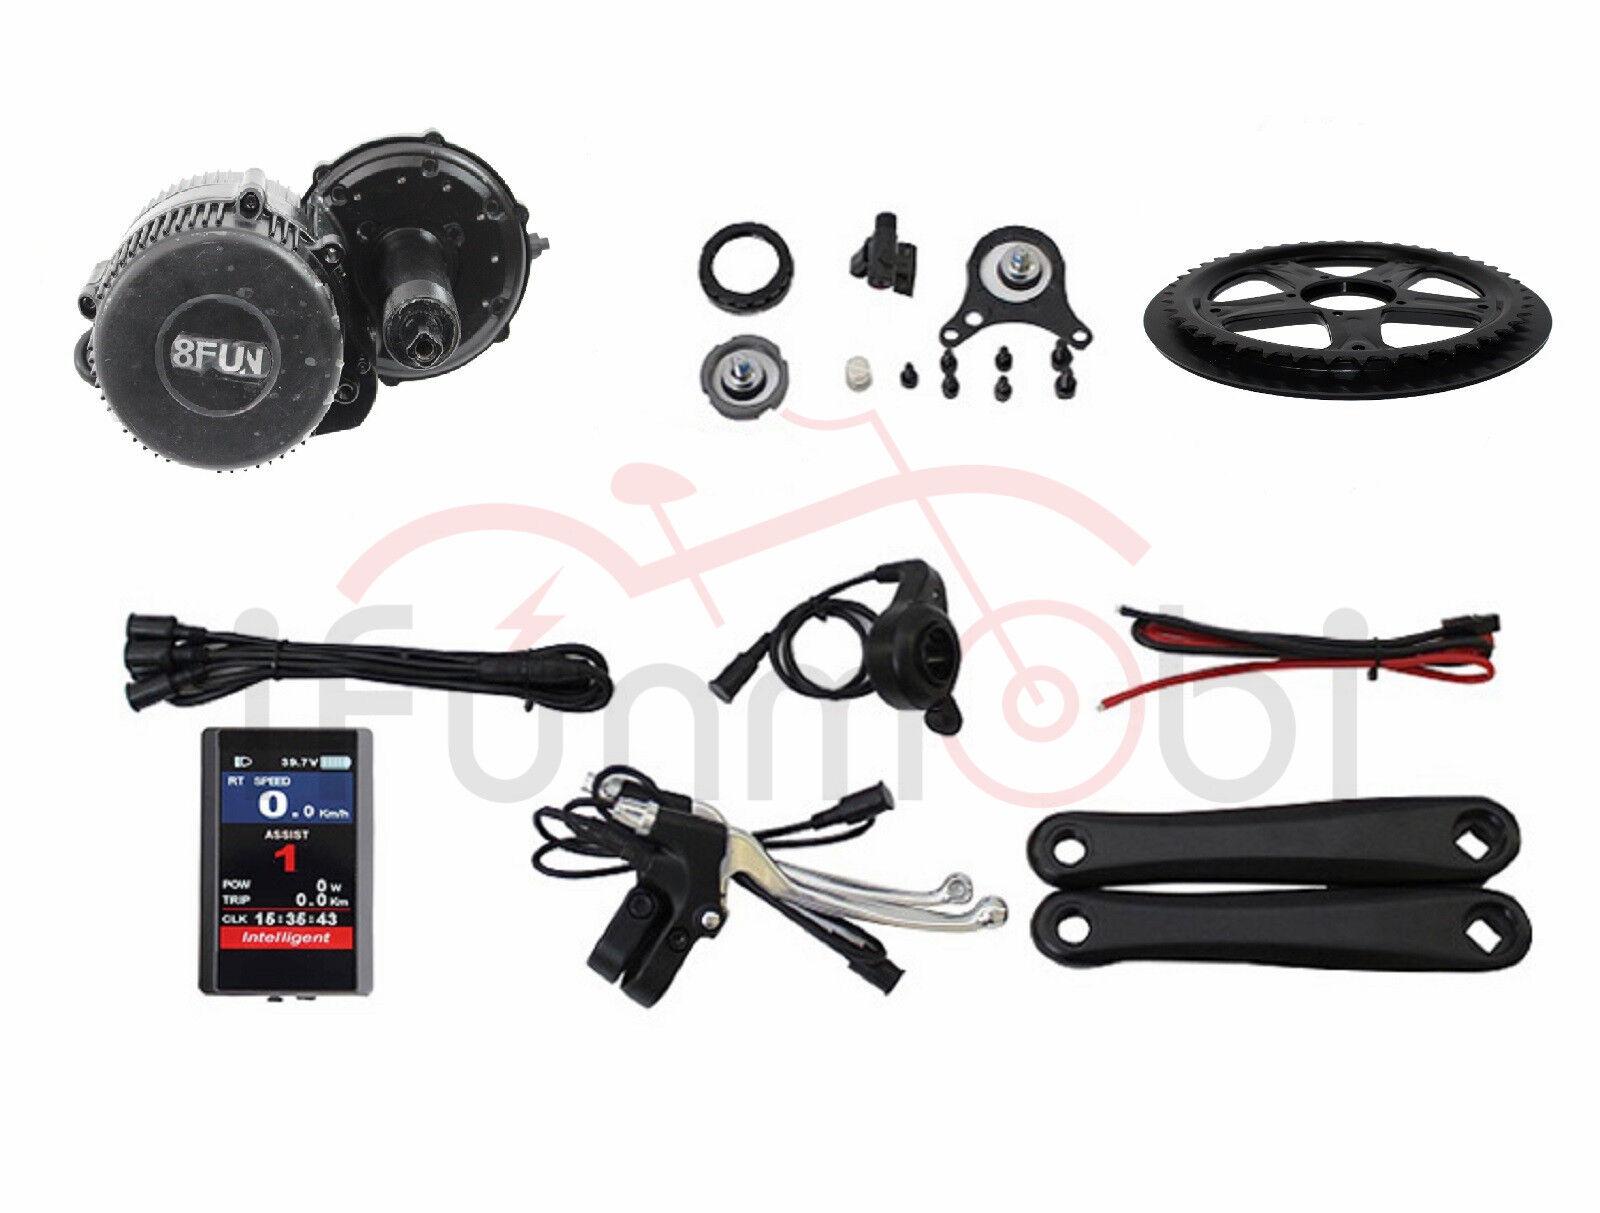 Bafang 8Fun BBS02 48V 750W Mid-Drive Motor E-Bike Conversion Kits with color LCD